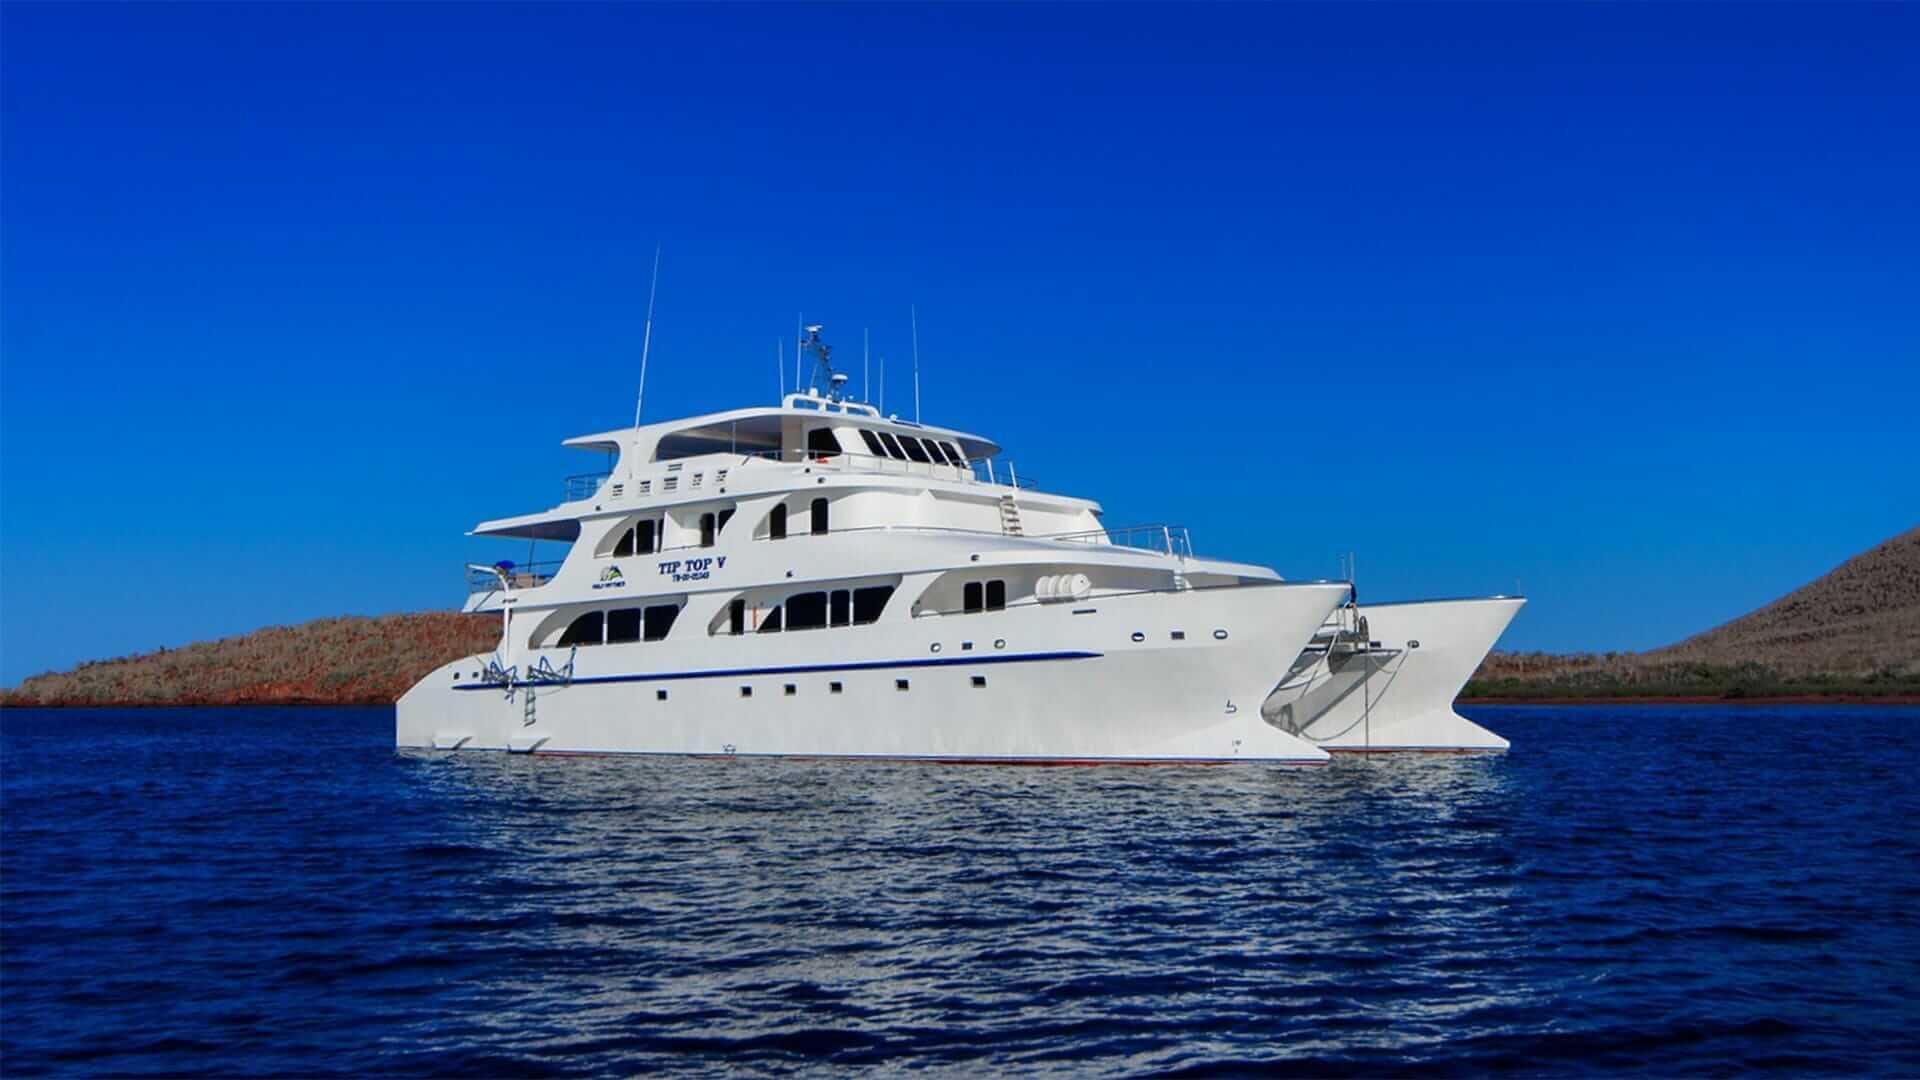 Tip Top V Catamaran